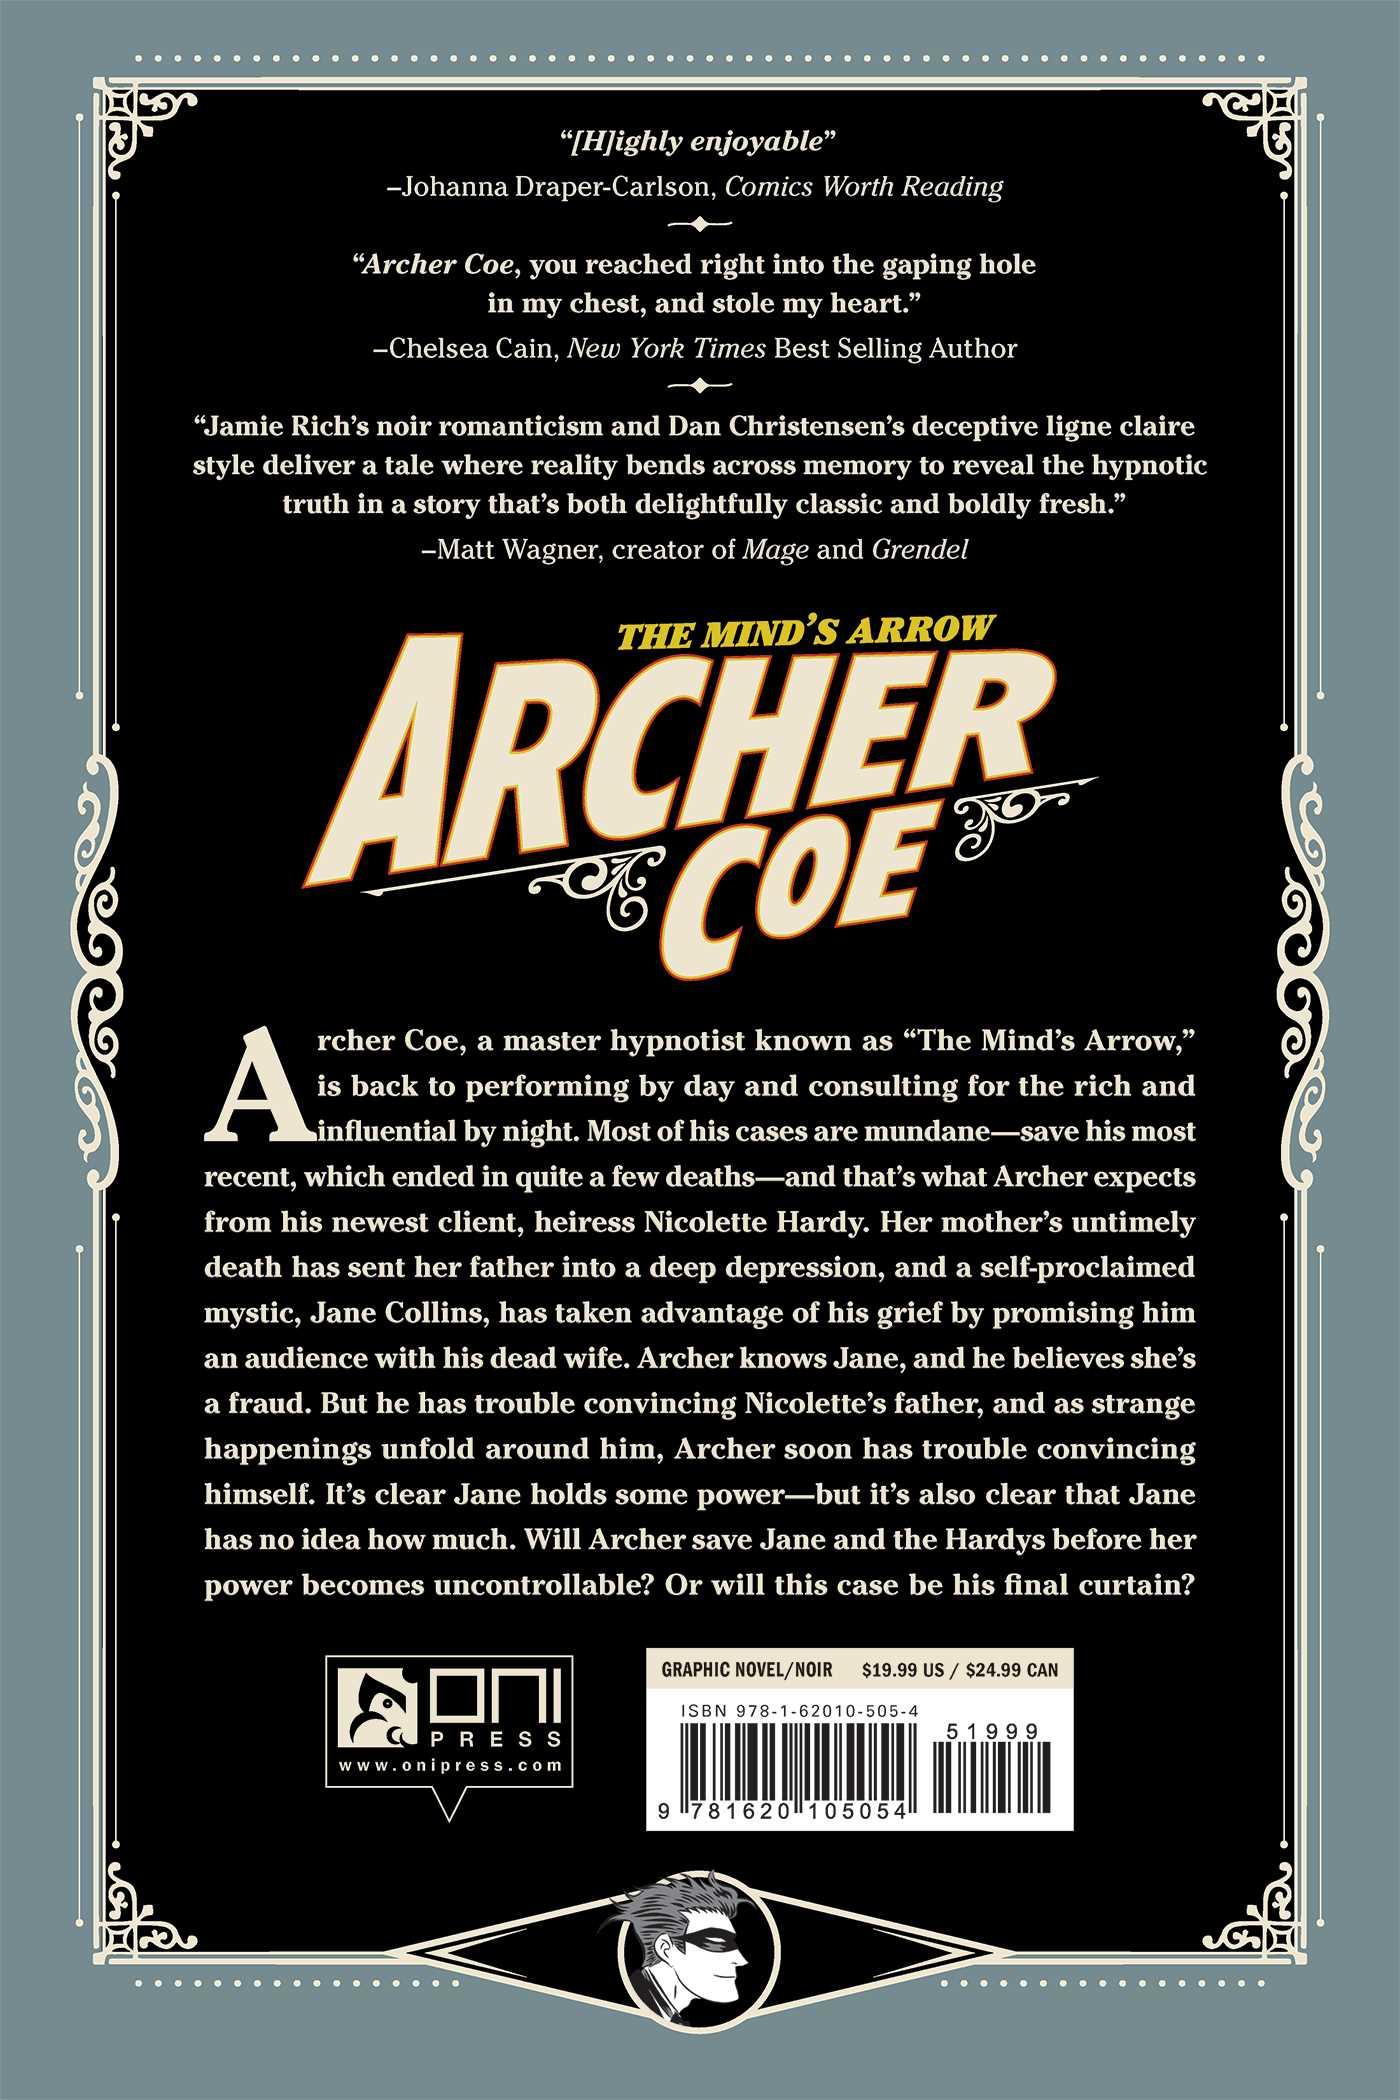 Archer coe vol 2 9781620105054 hr back